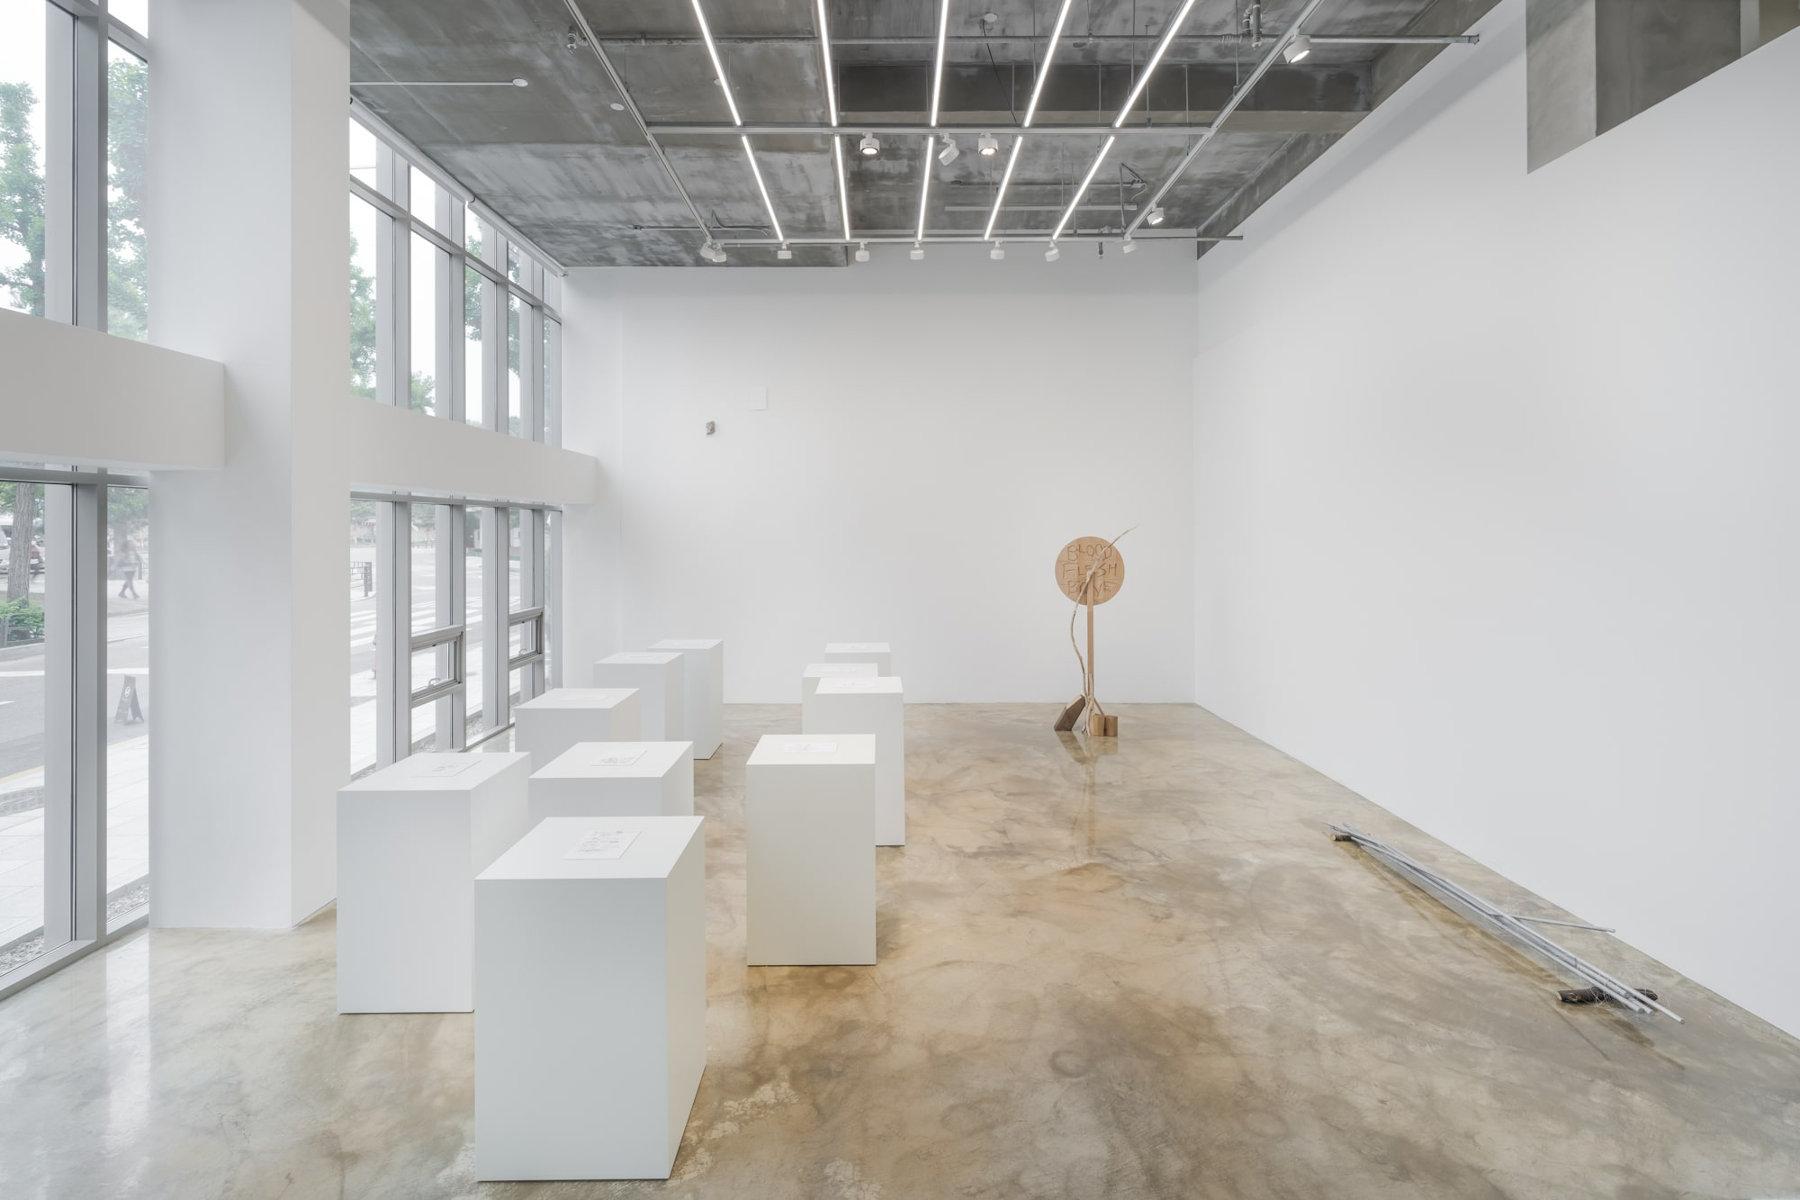 Barakat-Contemporary-Chung-Seoyoung-1